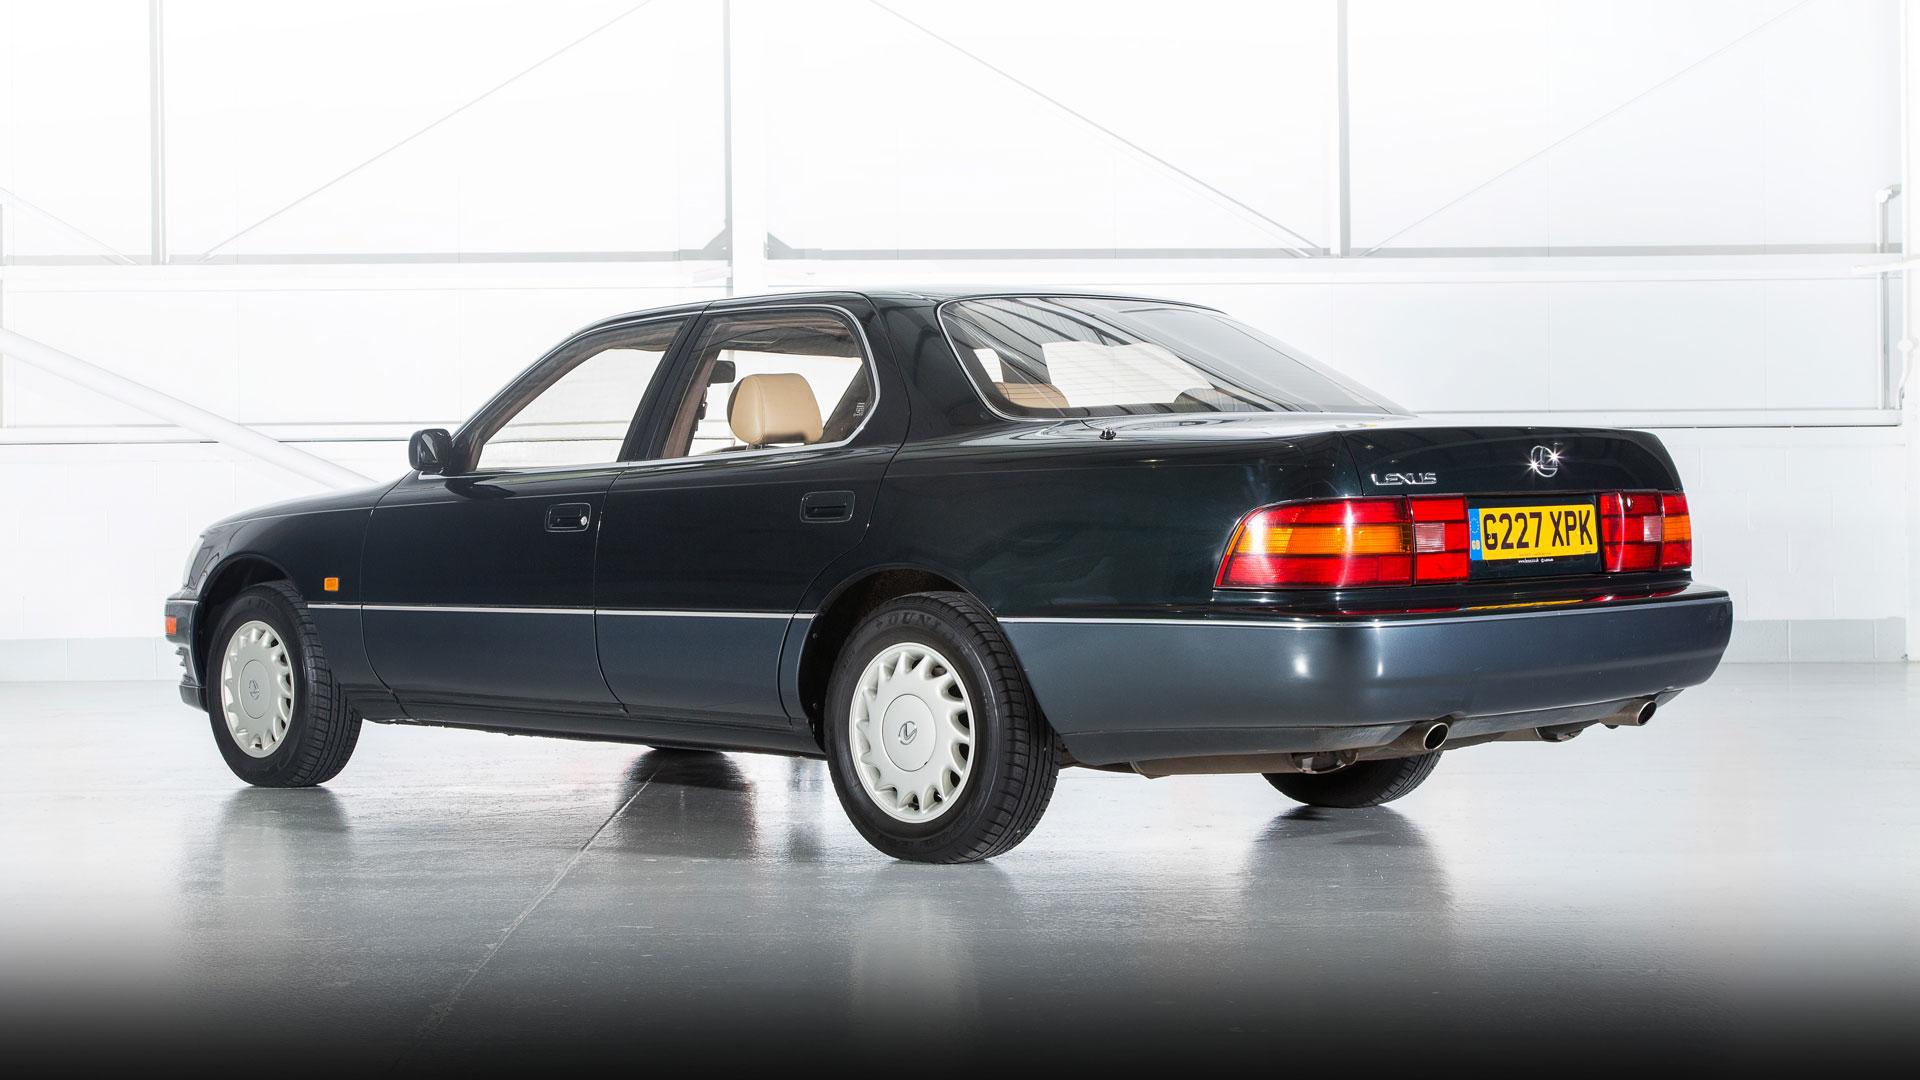 Lexus LS 400 UK 1990